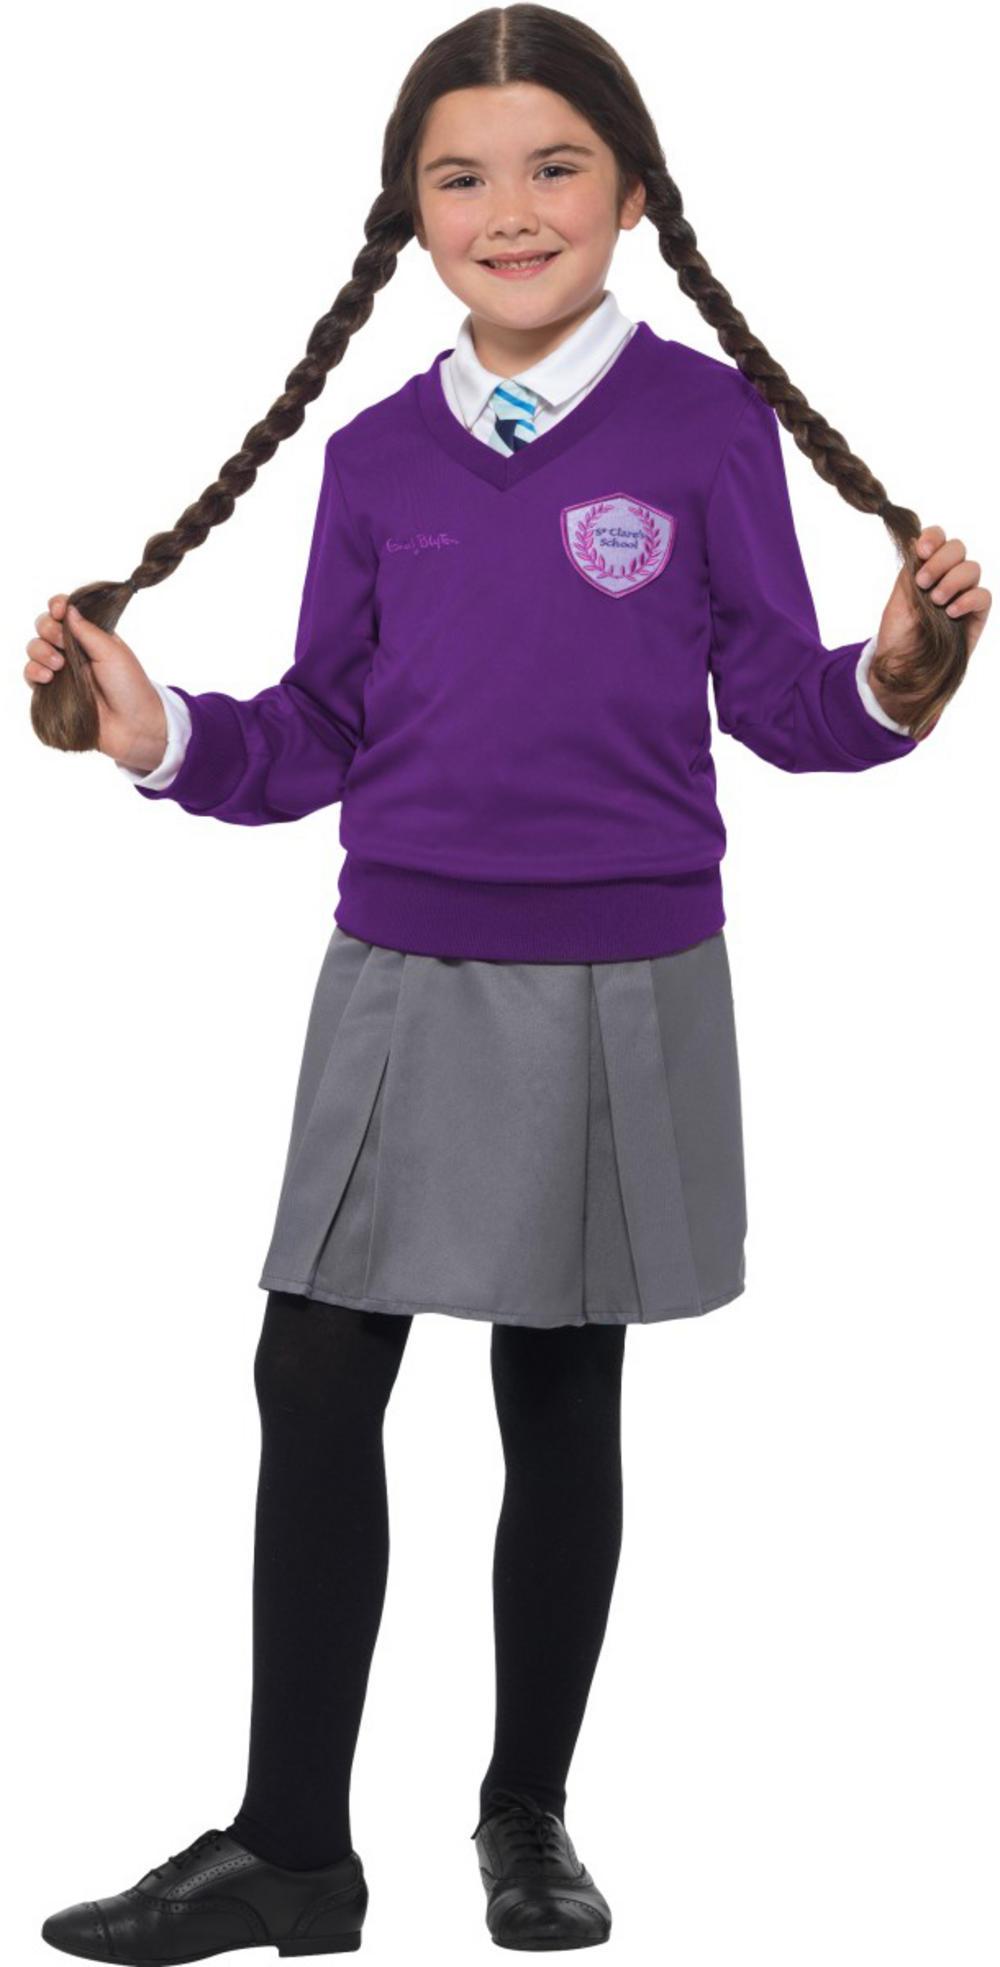 St Clares OSullivan Twins Girls Costume